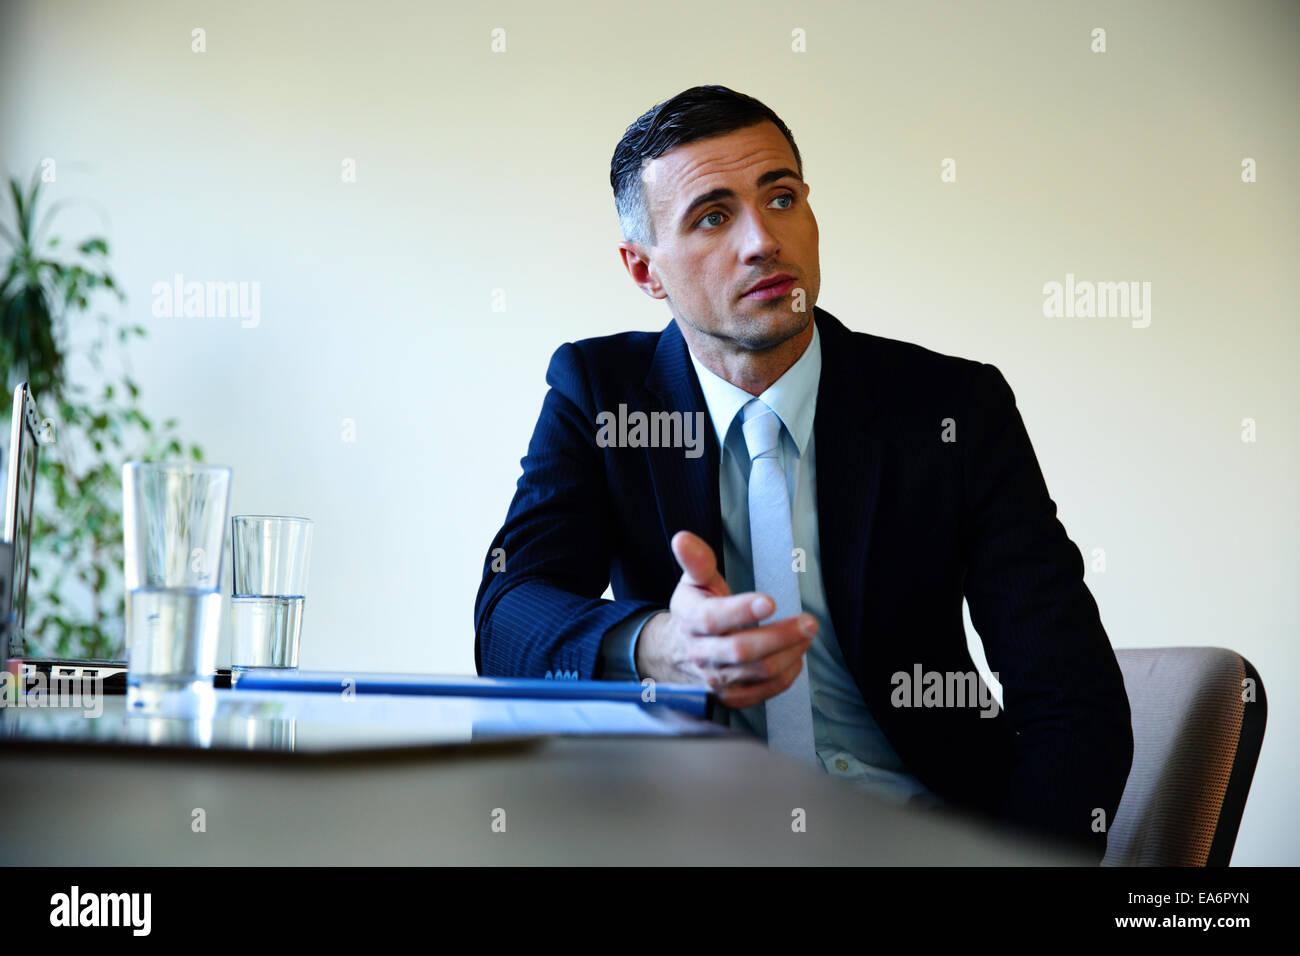 Businessman sitting at the table and explaining something - Stock Image